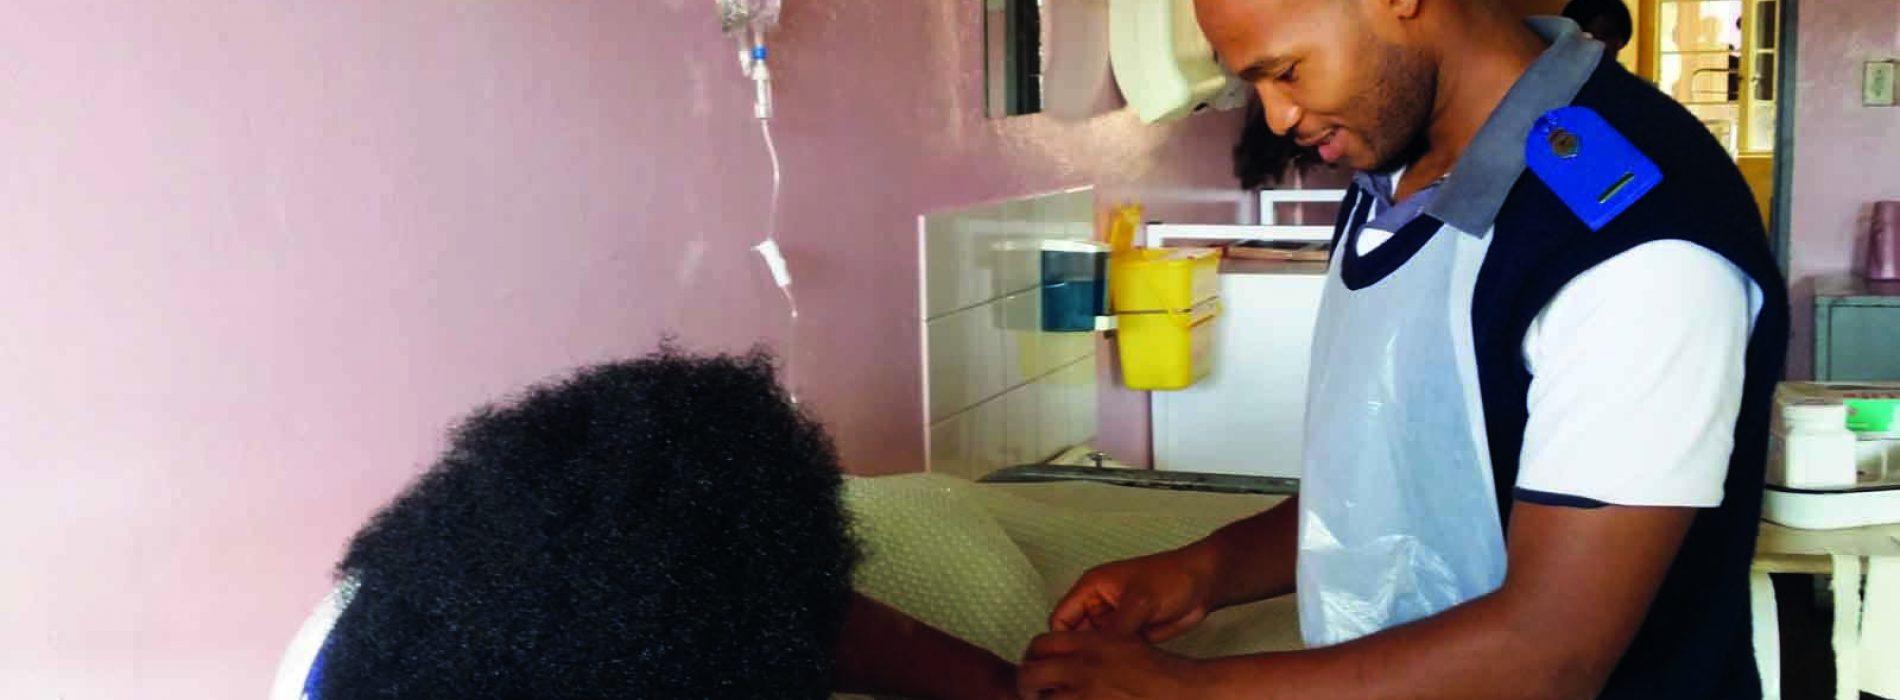 The trauma of nursing